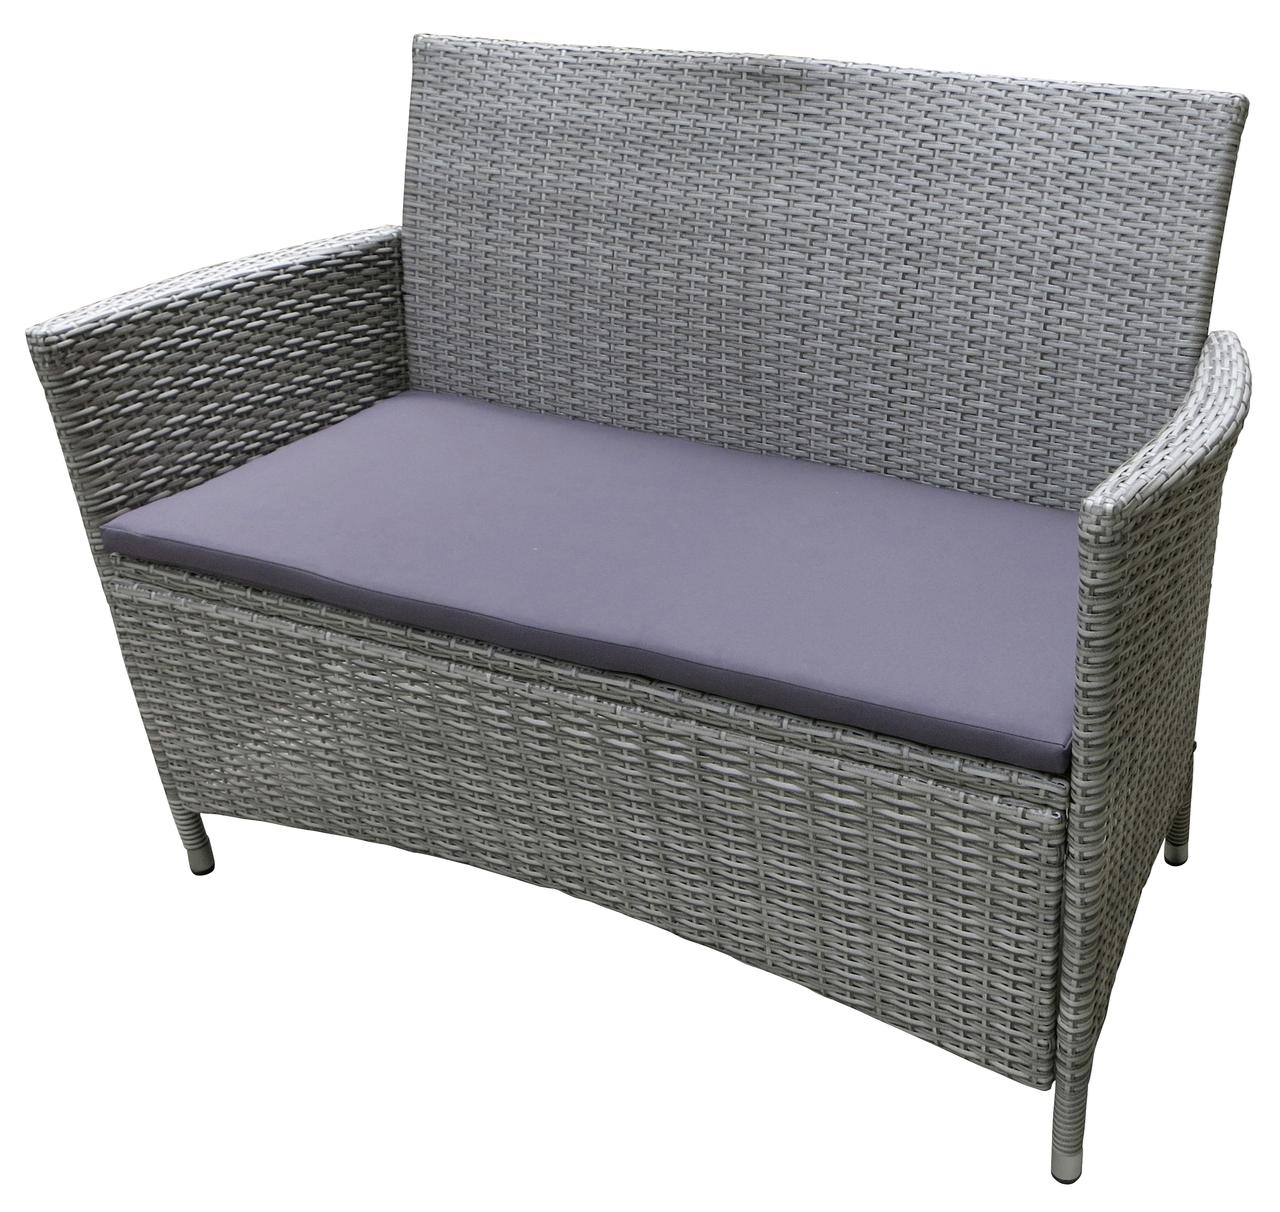 tarrington house bank noelani schwarz silber b nke. Black Bedroom Furniture Sets. Home Design Ideas